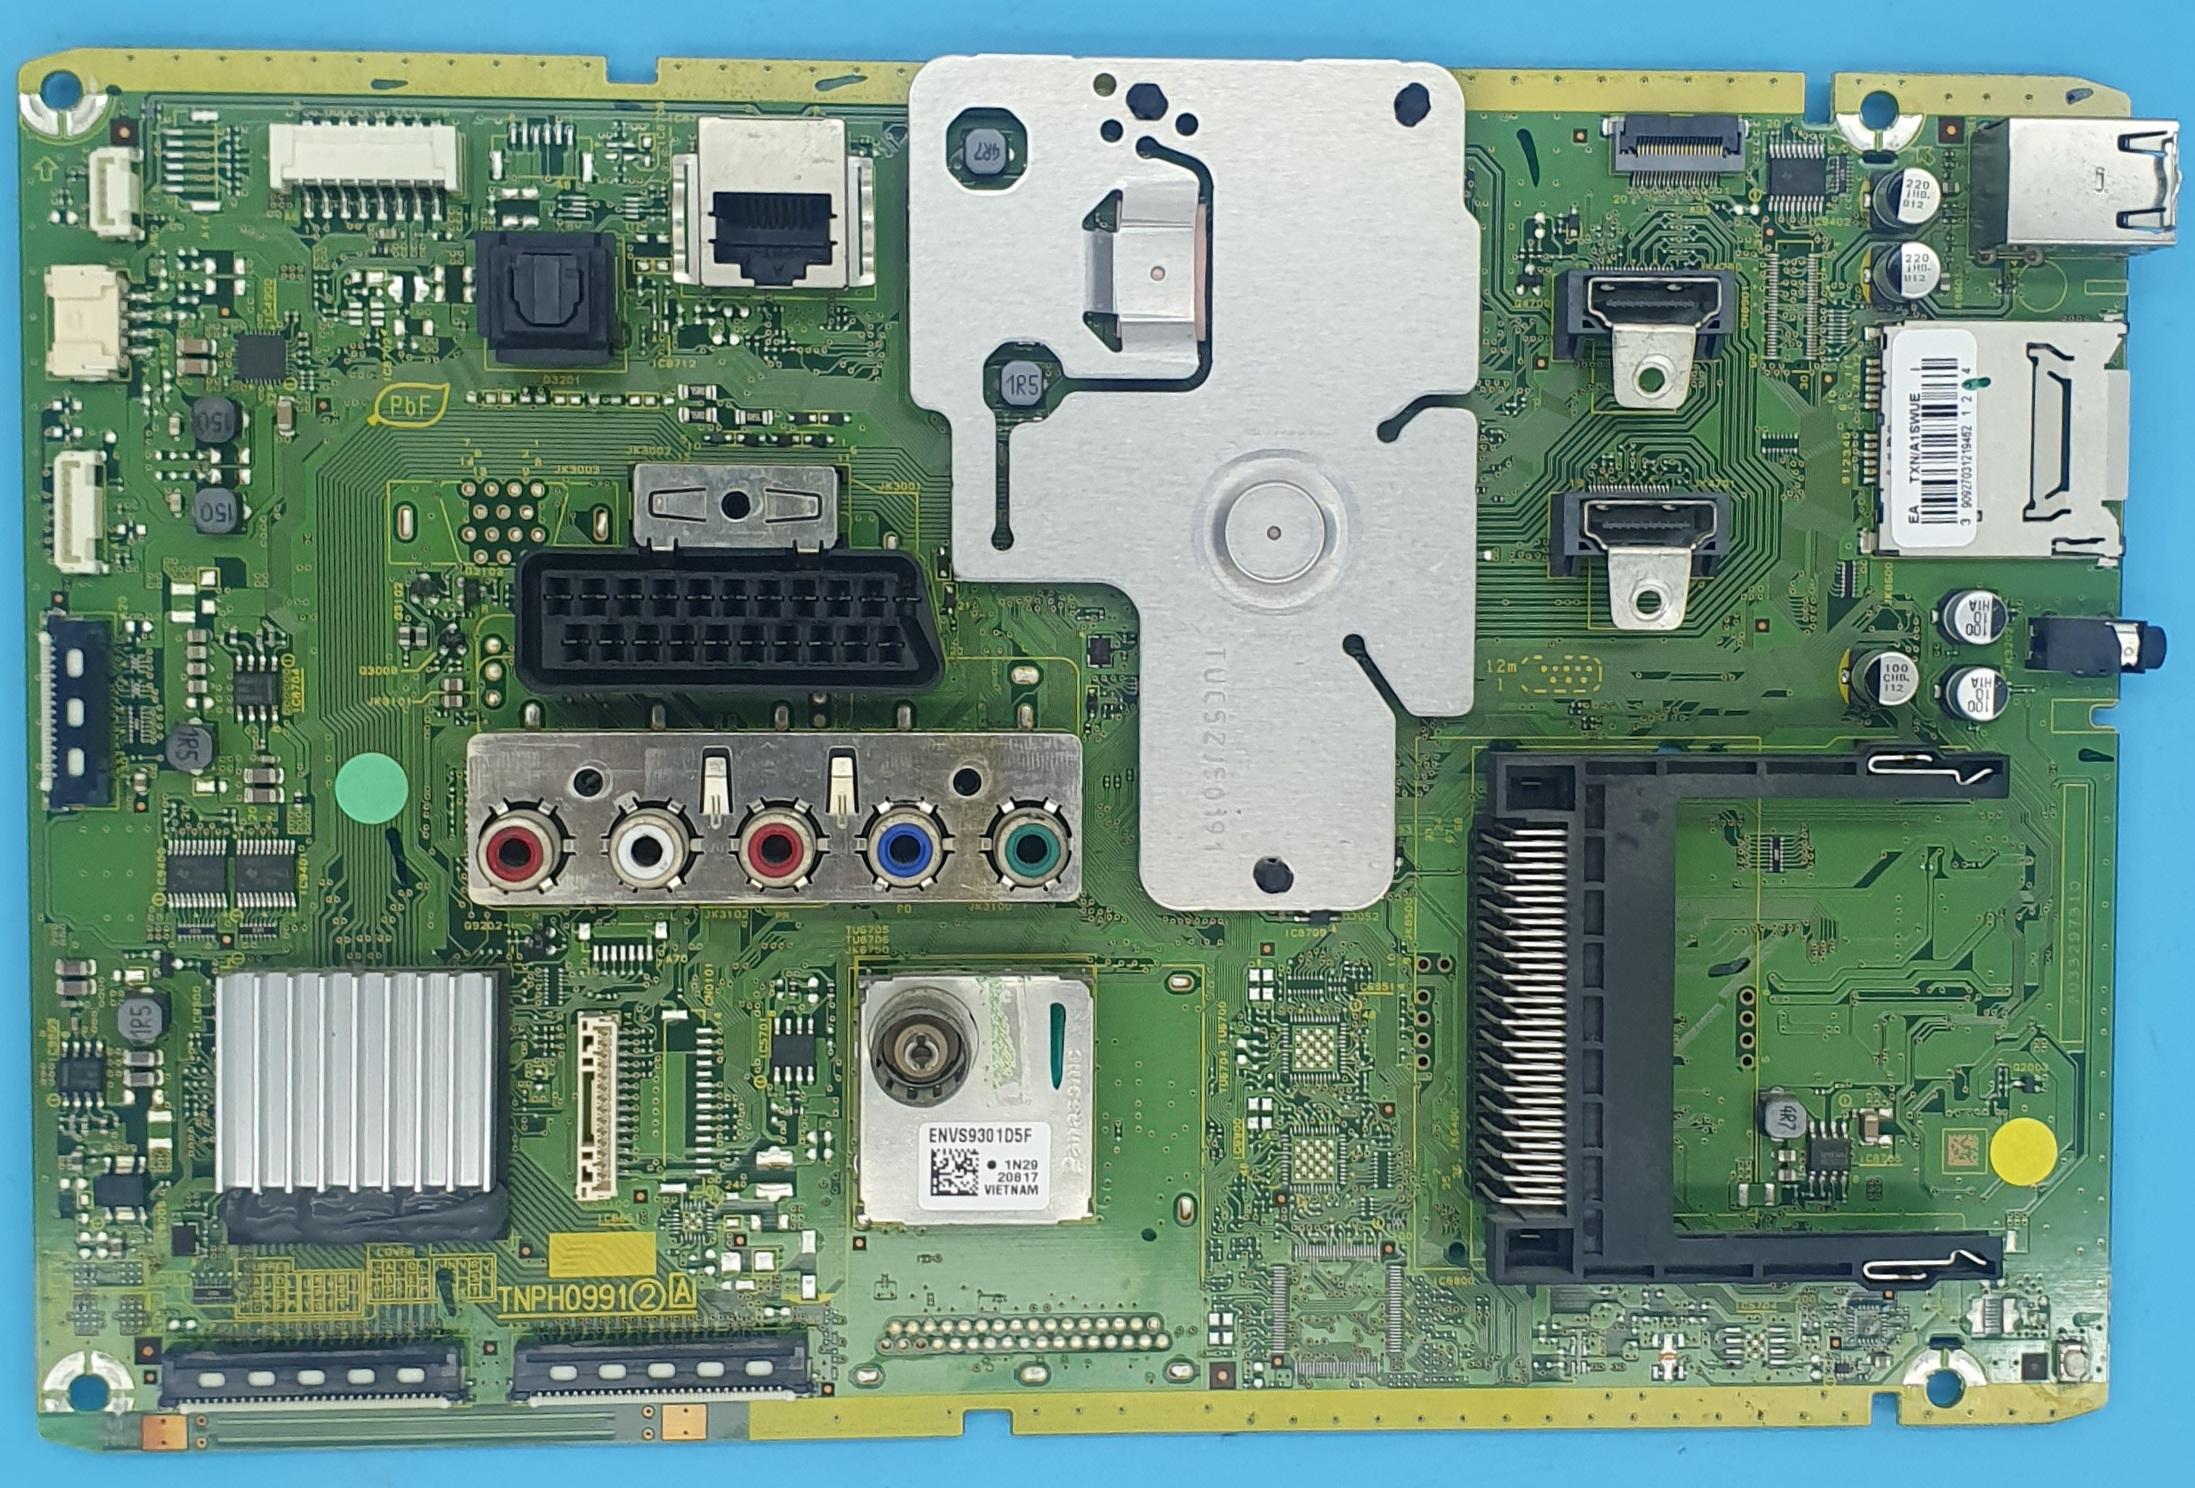 TNPH09912A Panasonic Anakart (KDV DAHİL = 200 TL)